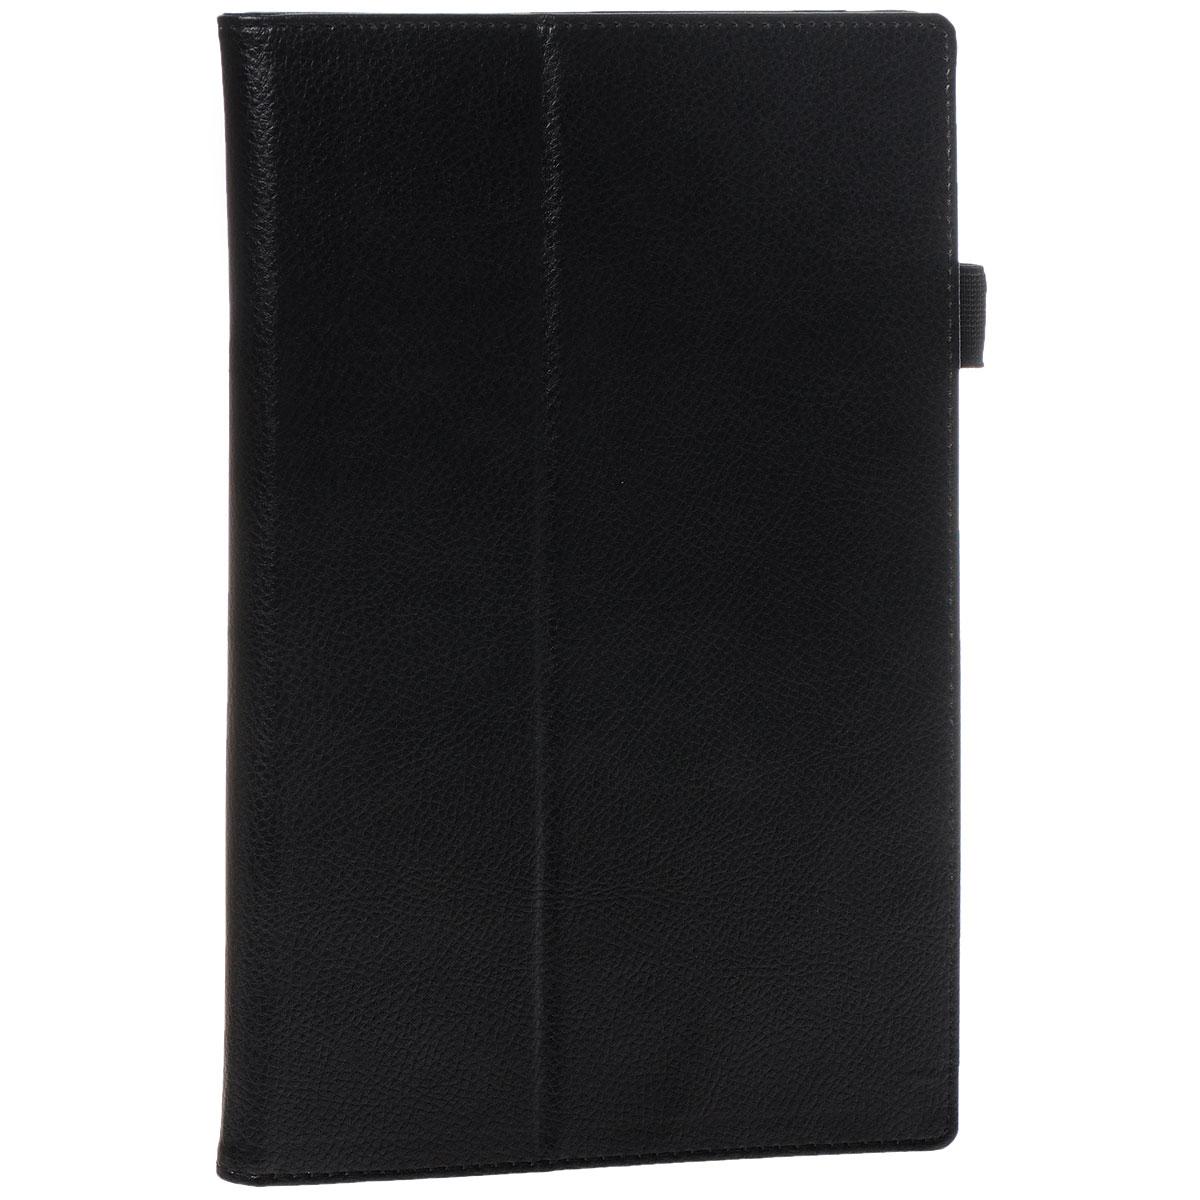 IT Baggage чехол для Nokia Lumia 2520, Black untamo alto book case чехол для nokia lumia 1320